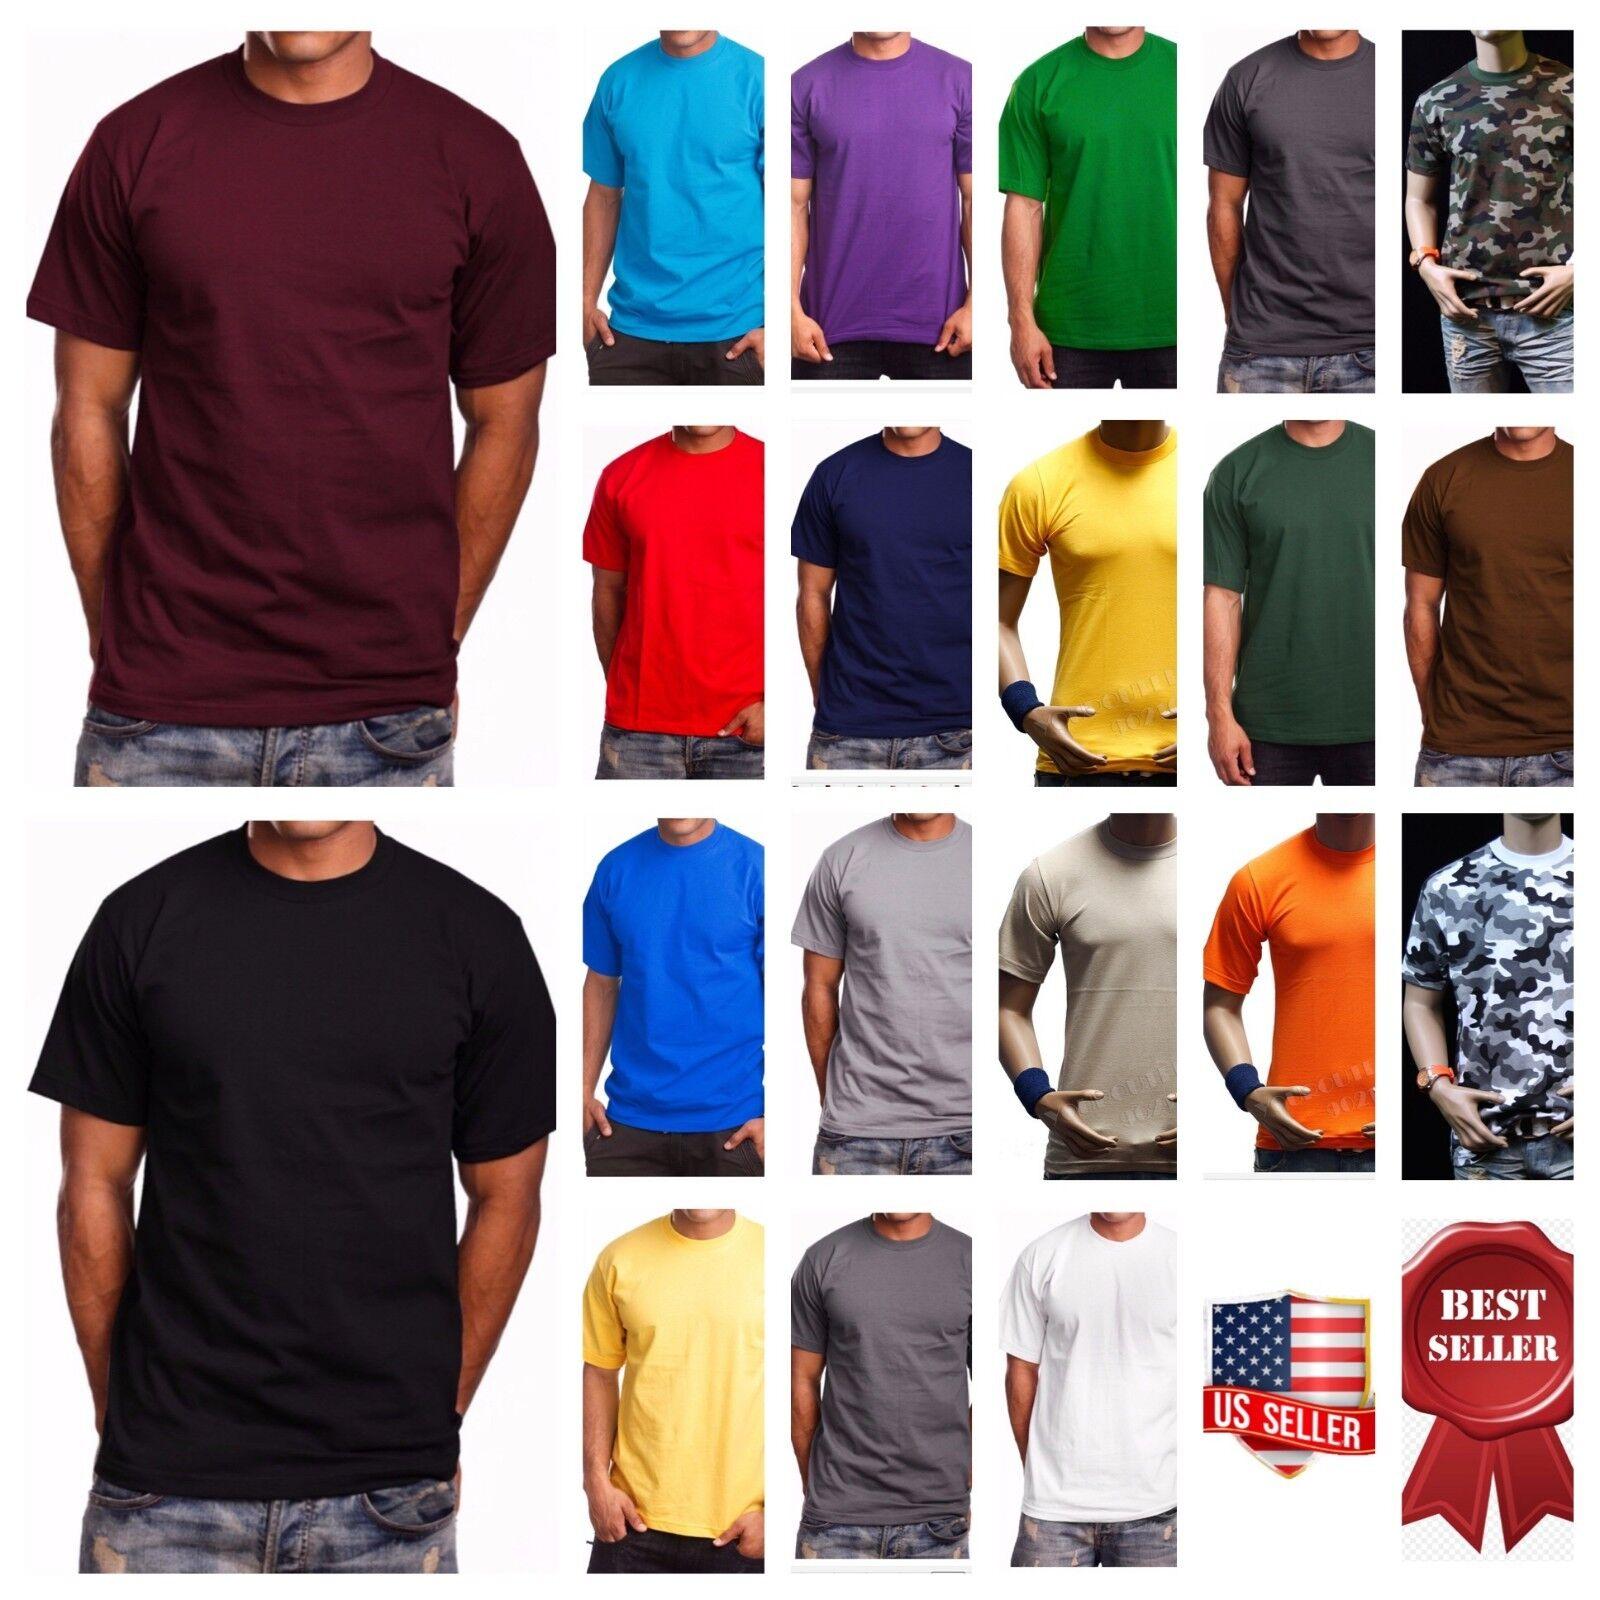 как выглядит Мужская футболка  Mens HEAVY WEIGHT T-Shirt Plain Short Sleeve Casual Crew Neck Fashion Tee S-7X фото